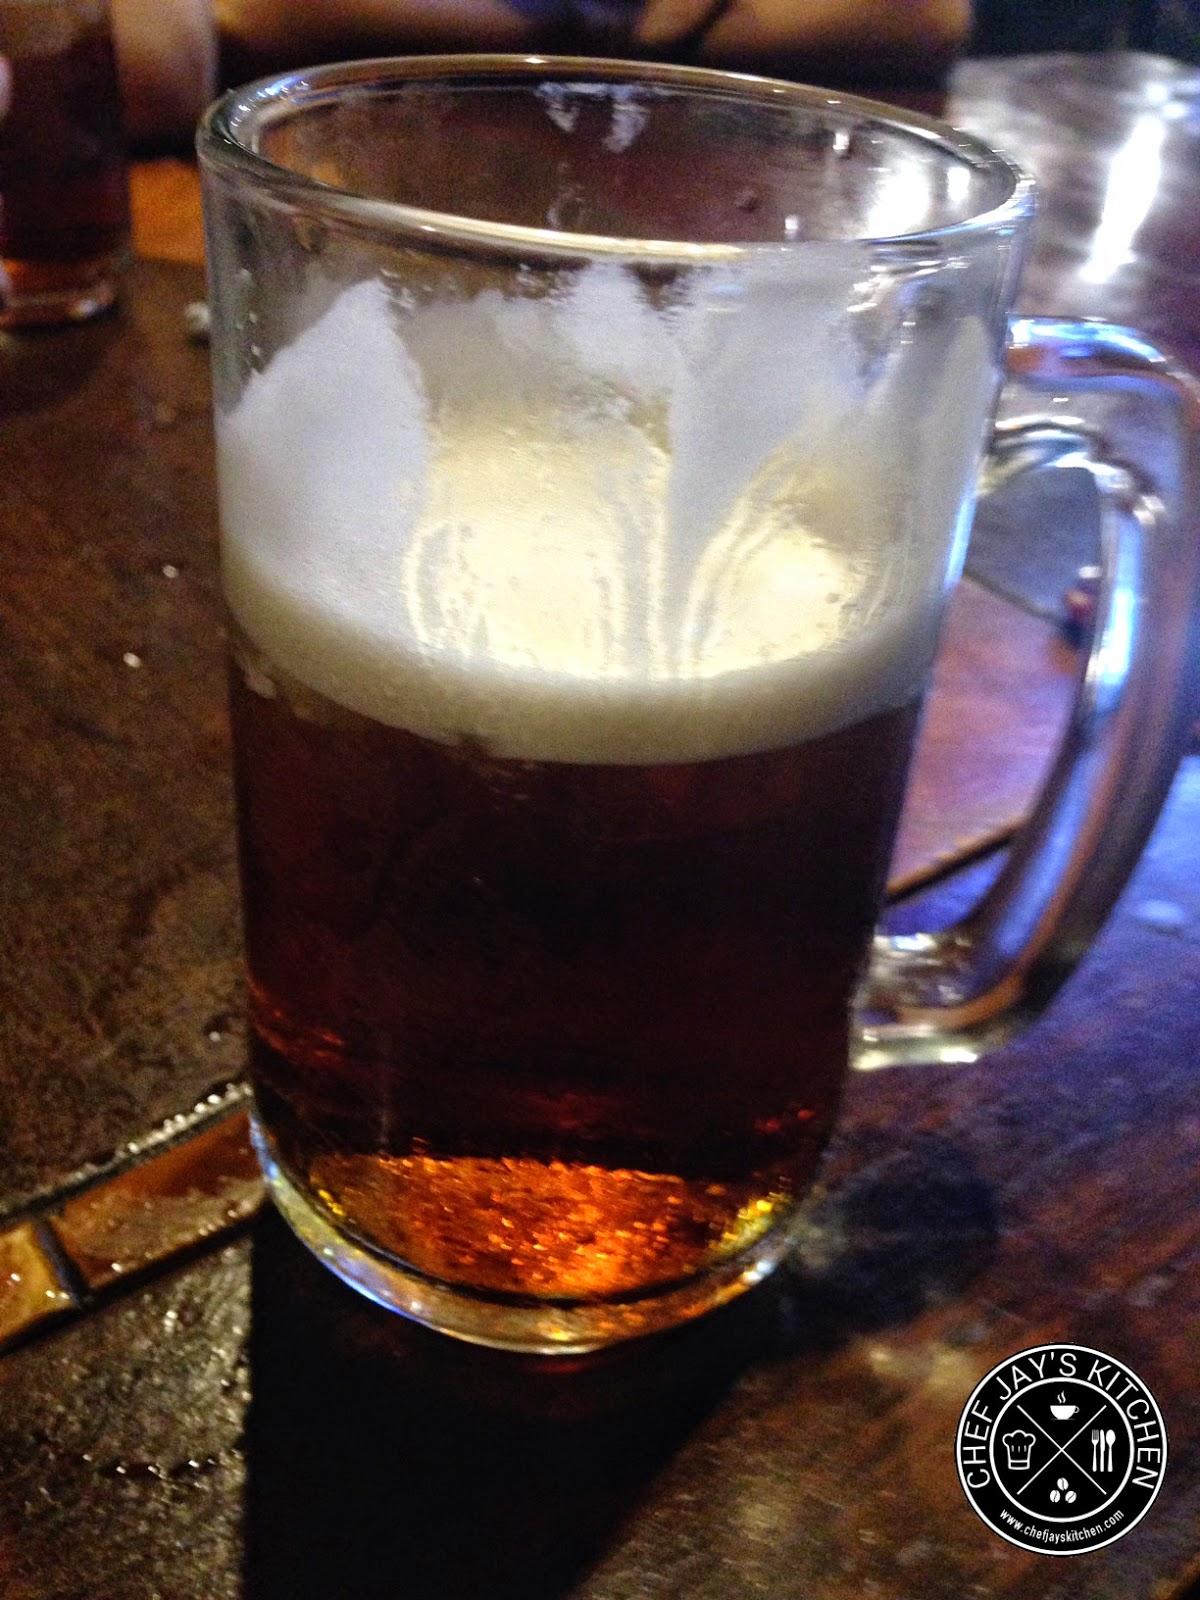 John Smith Beer Extra Smooth Iloilo City